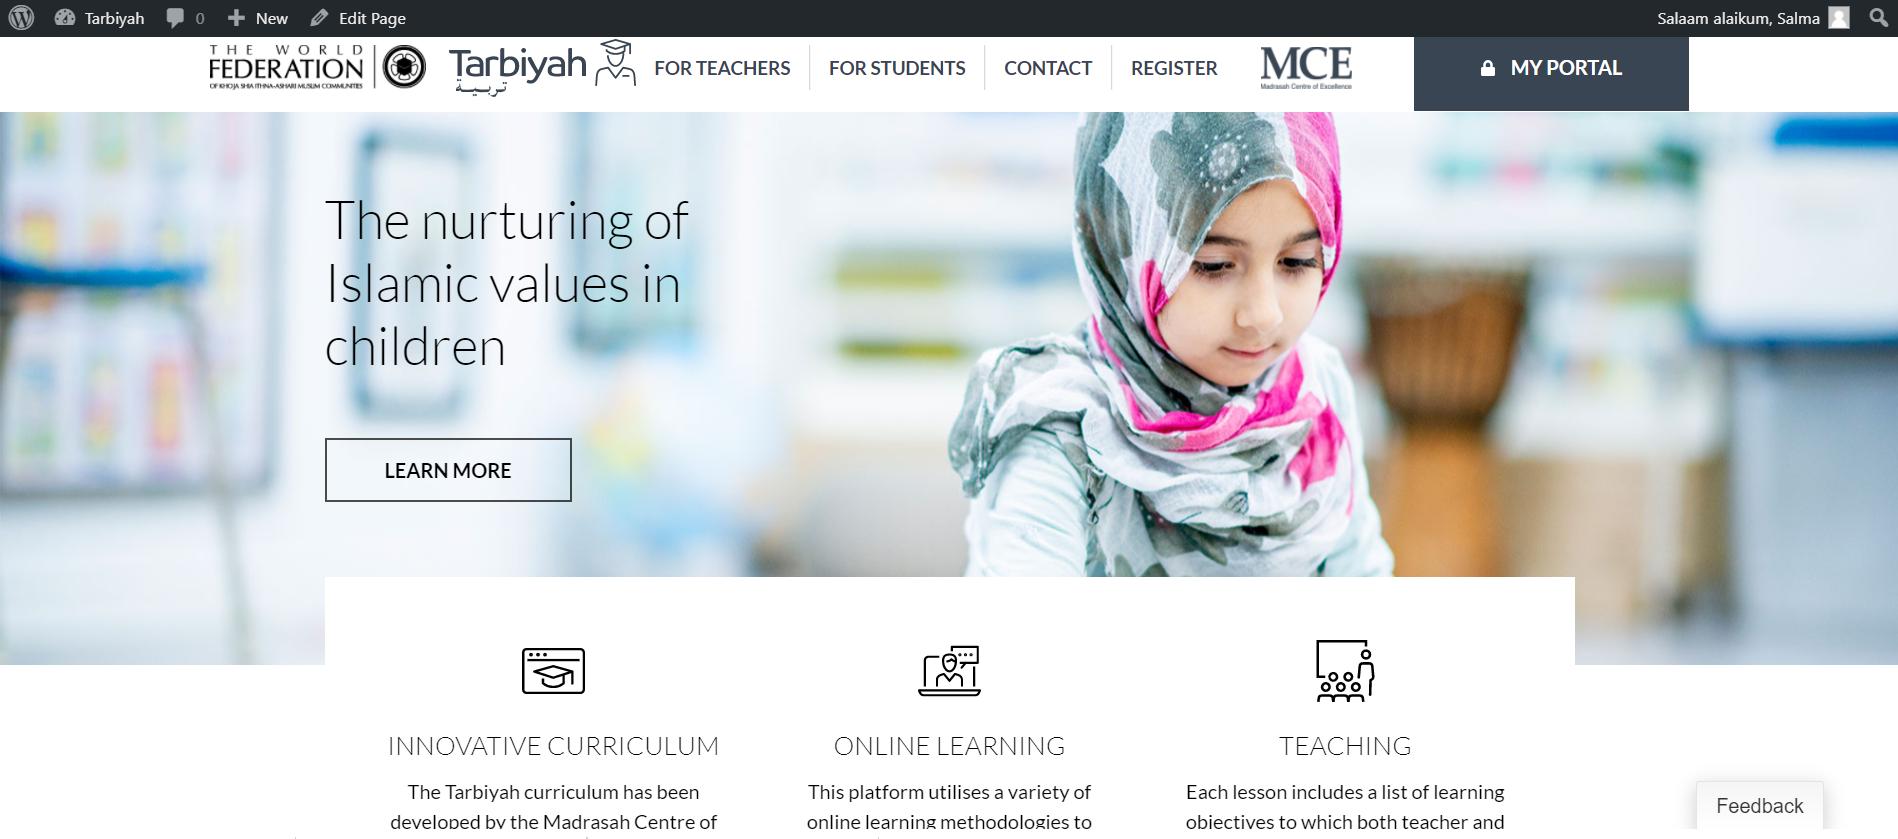 Tarbiyah Digital Platform Tutorials